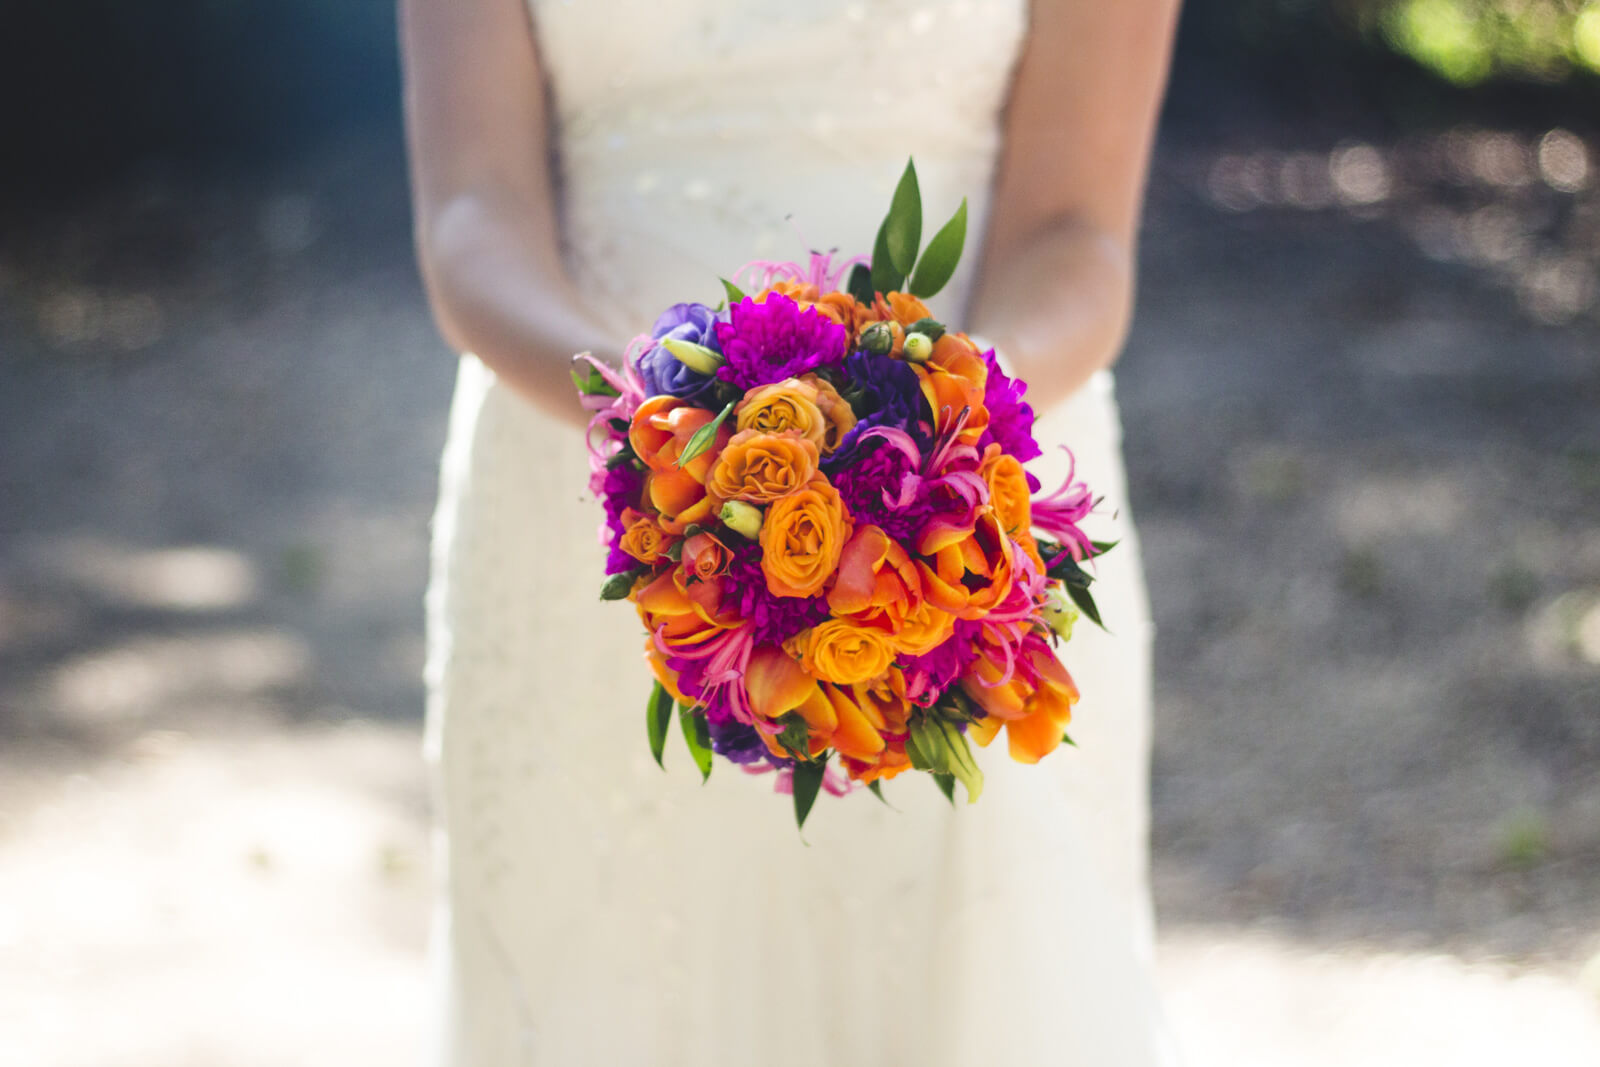 Bouquet de novia - Stef & Guille - Casa Parque Nos - Fotografía de matrimonios